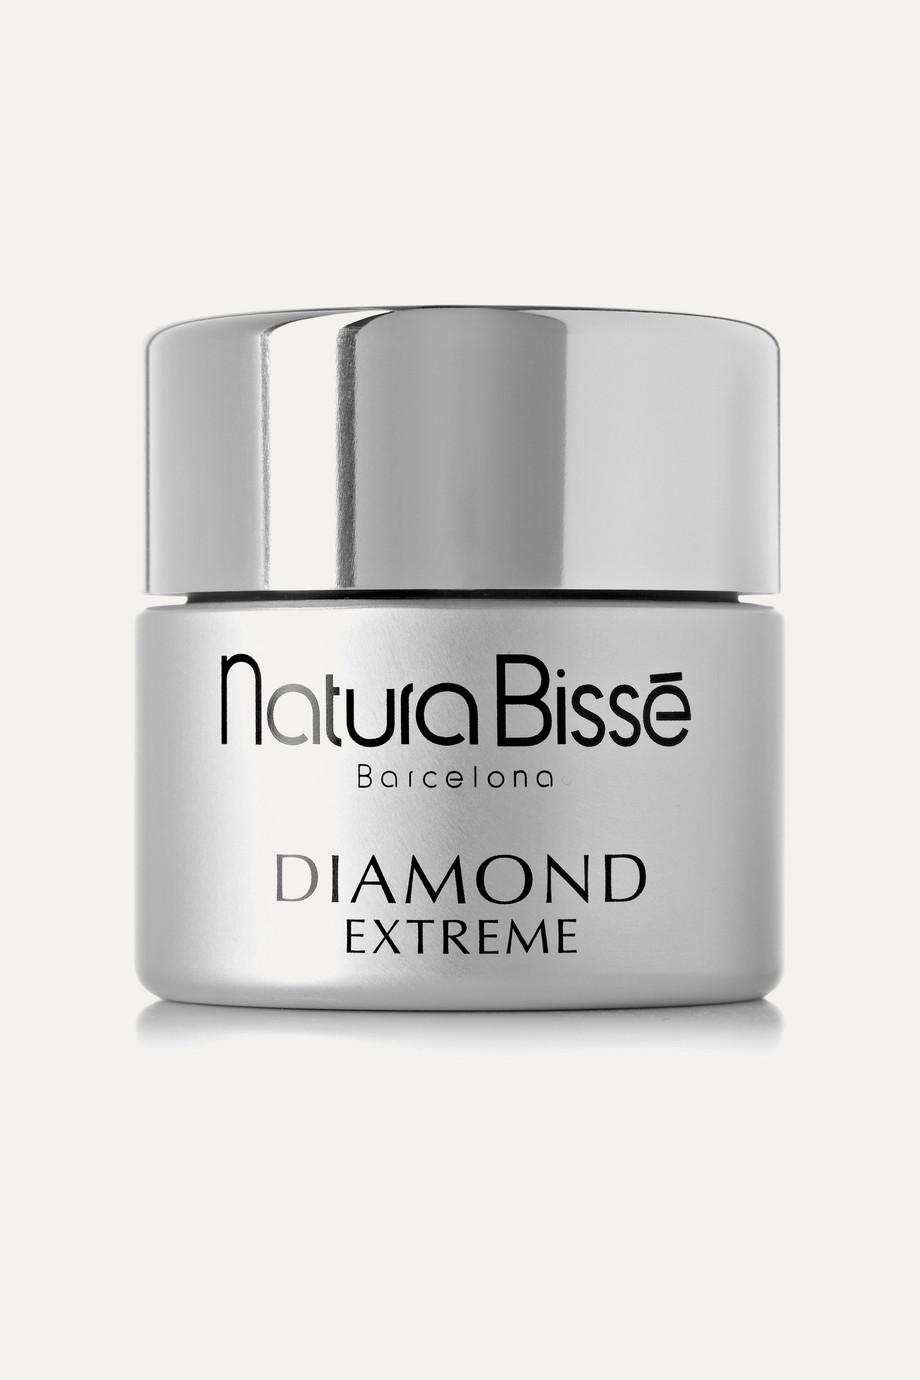 Natura Bissé Diamond Extreme, 50 ml – Gesichtscreme